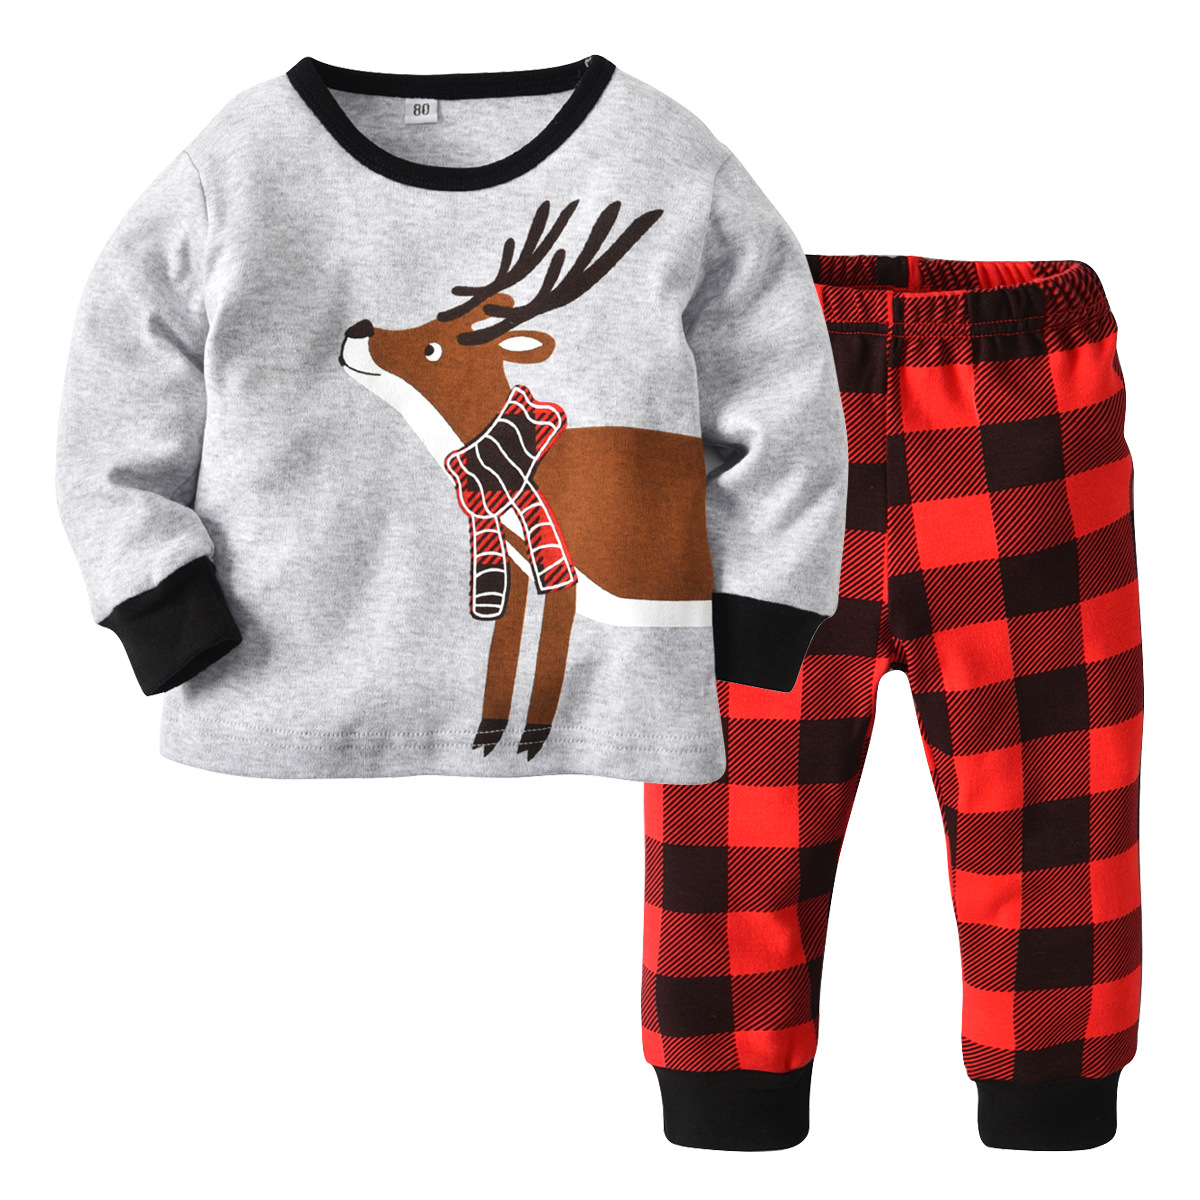 Toddler 2 Pieces Print Deer Long Sleeve T-shirt and Plaid Pant Clothes Set